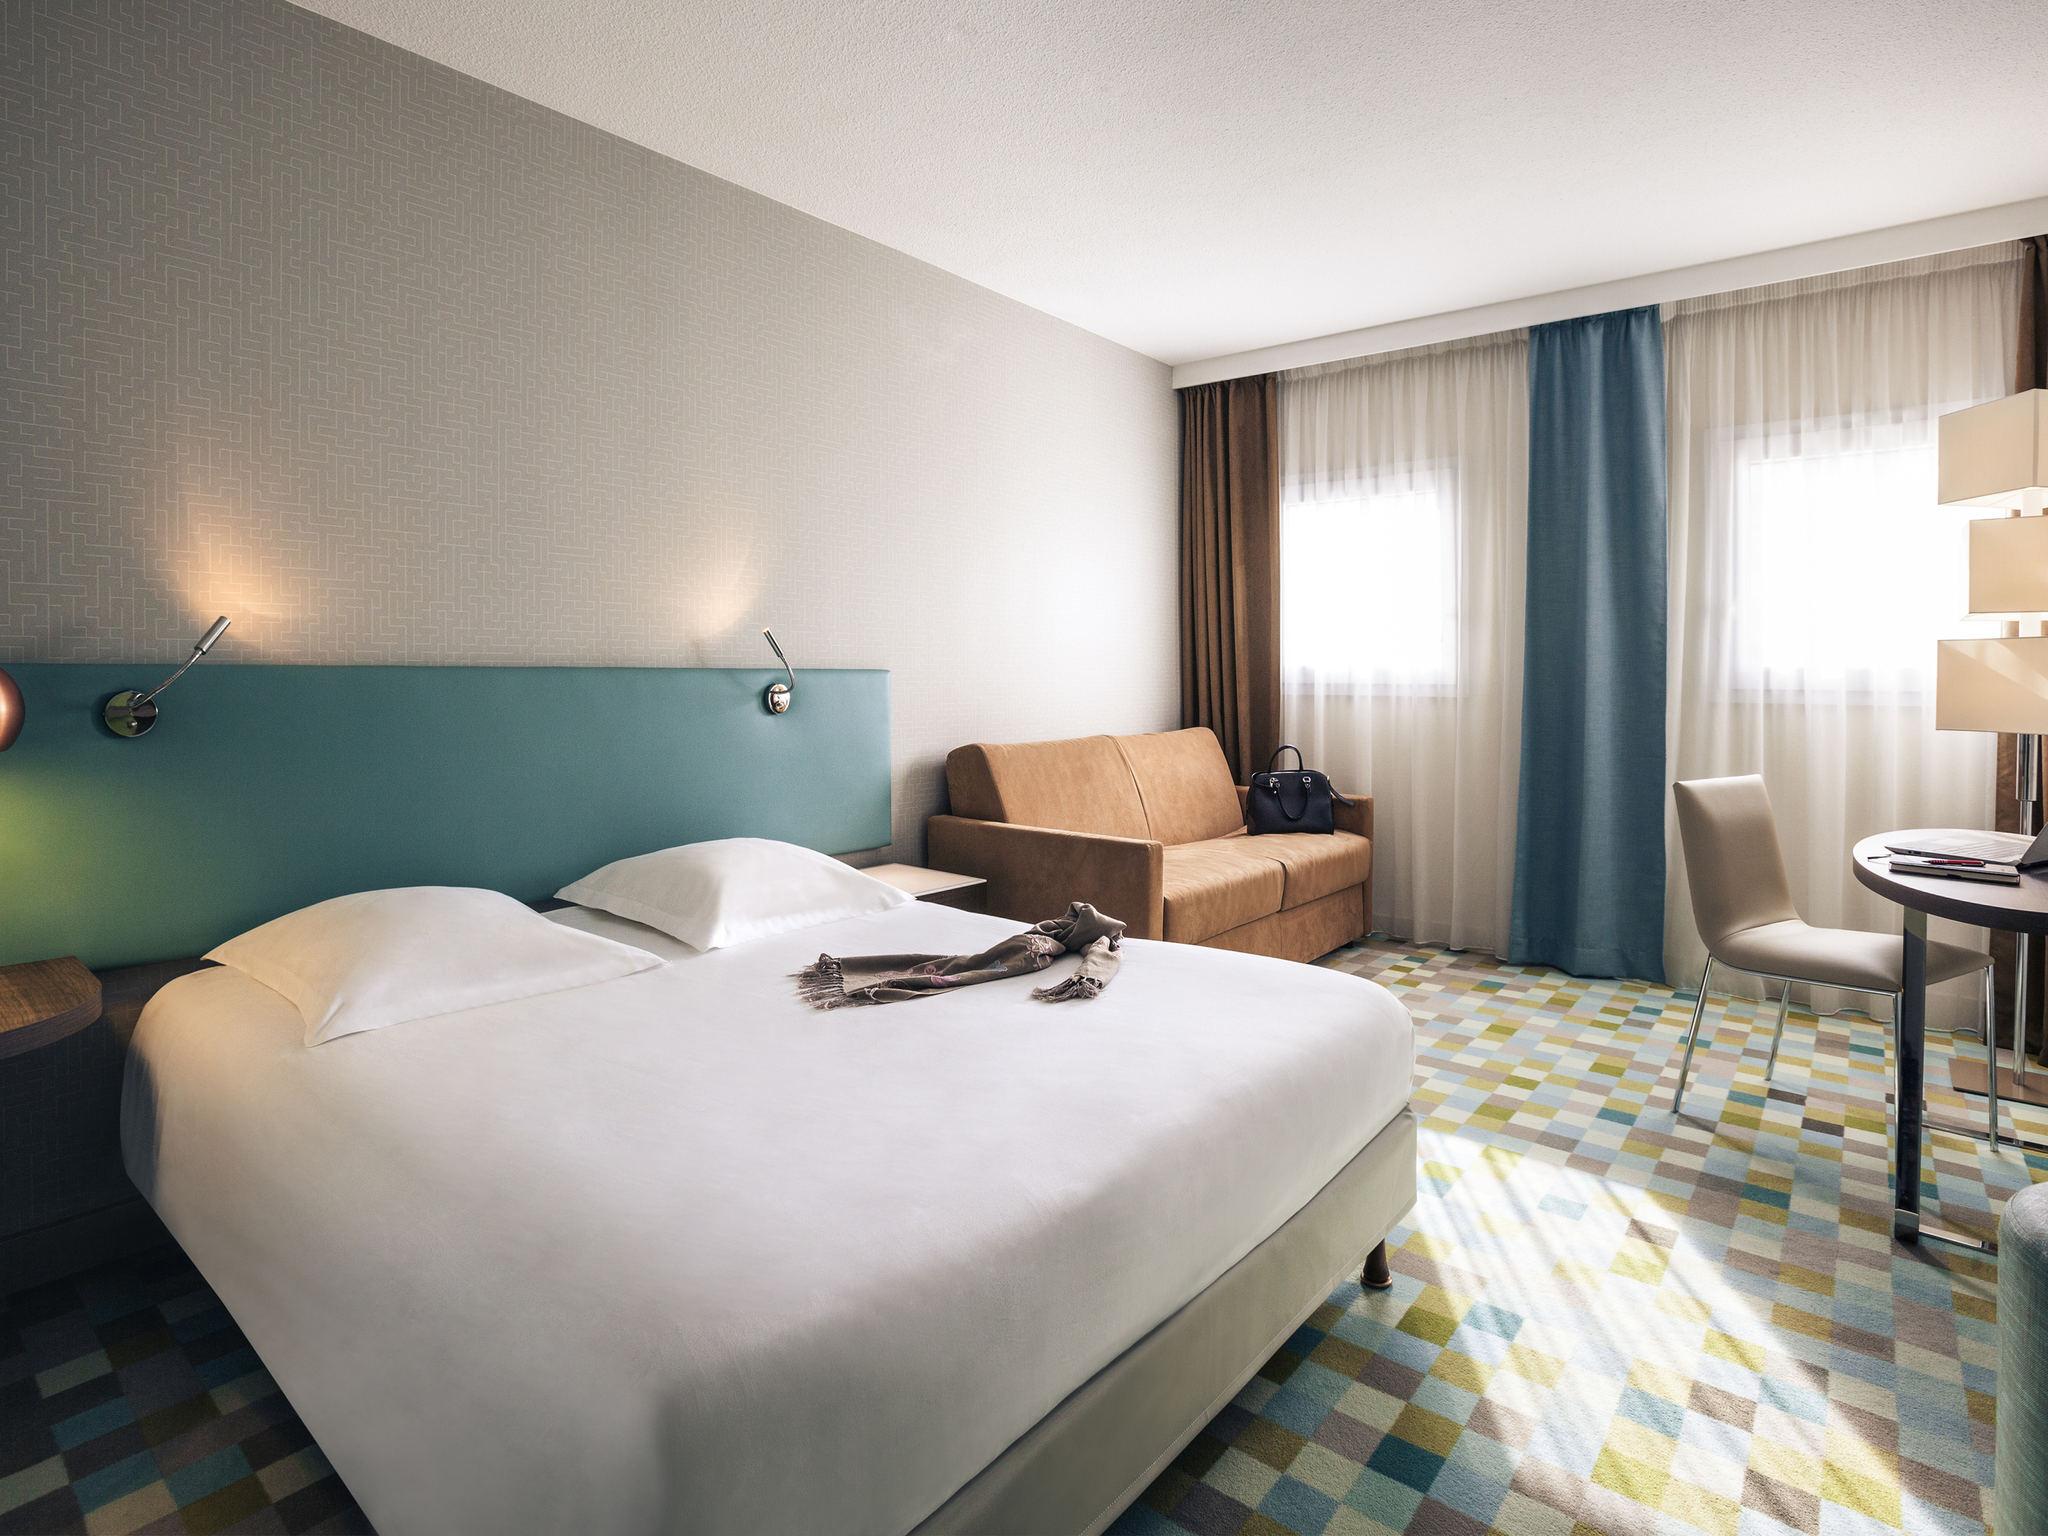 Hotell – Hôtel Mercure Marne-la-Vallée Bussy-Saint-Georges